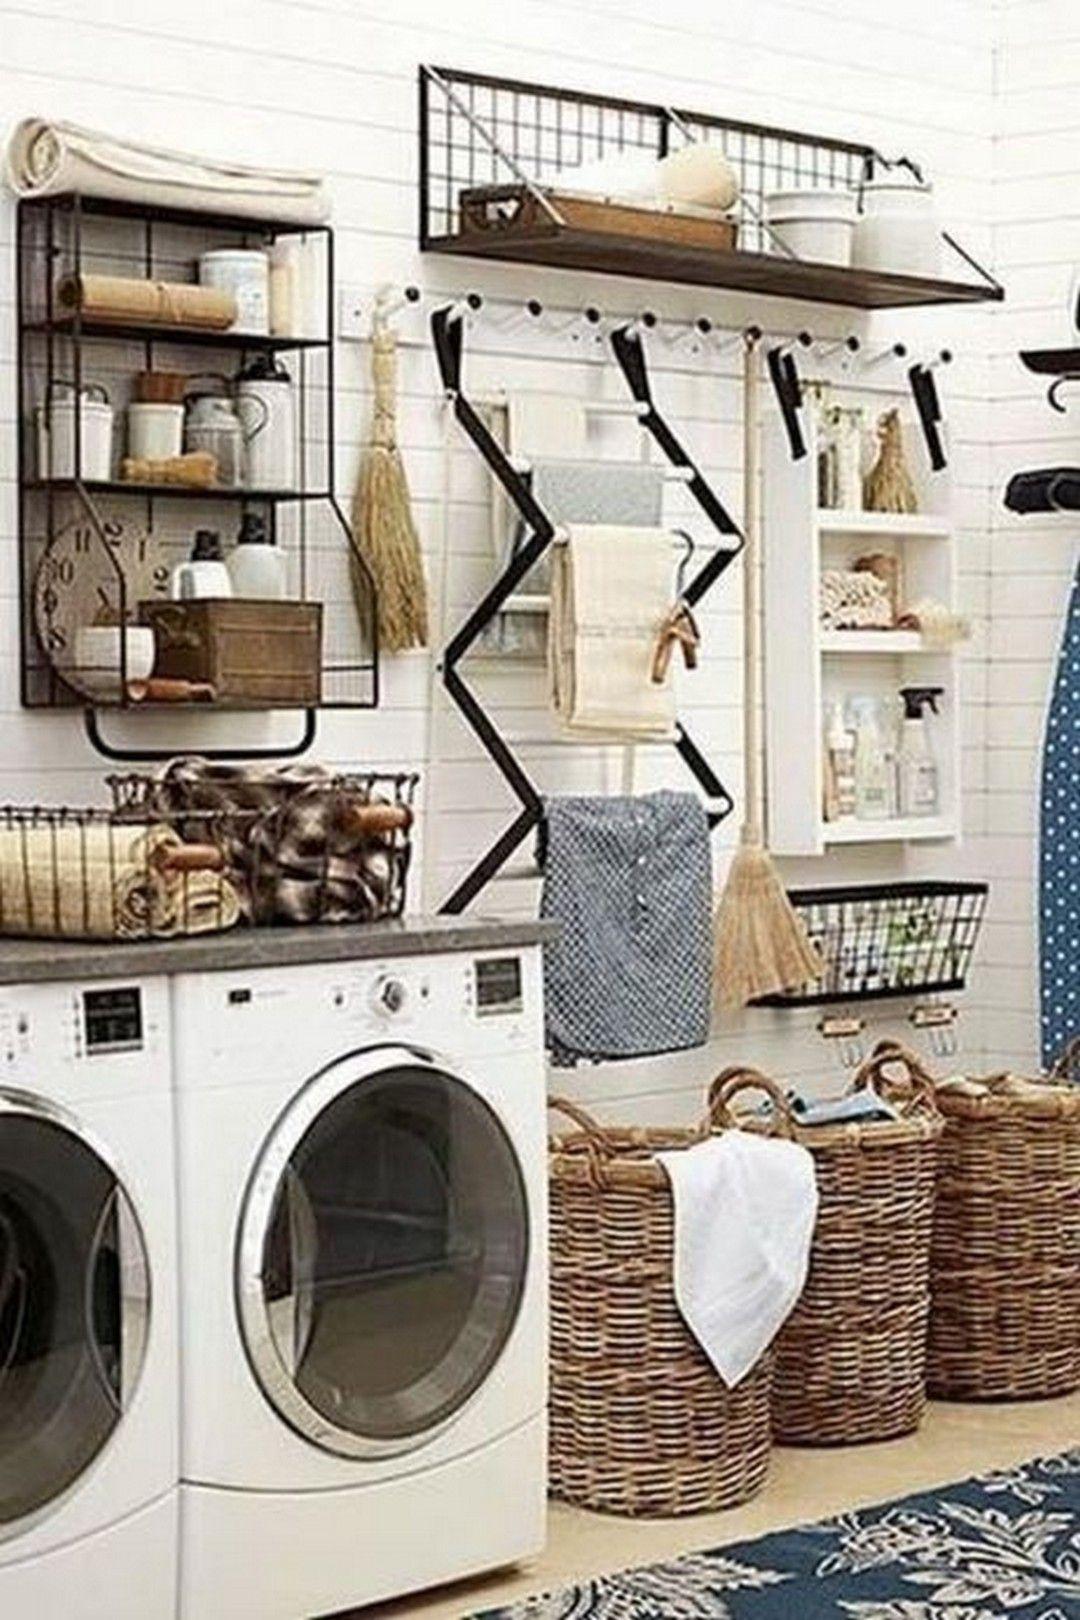 34 Laundry Storage And Organization Ideas Rustic Laundry Rooms Vintage Laundry Room Vintage Laundry Room Decor